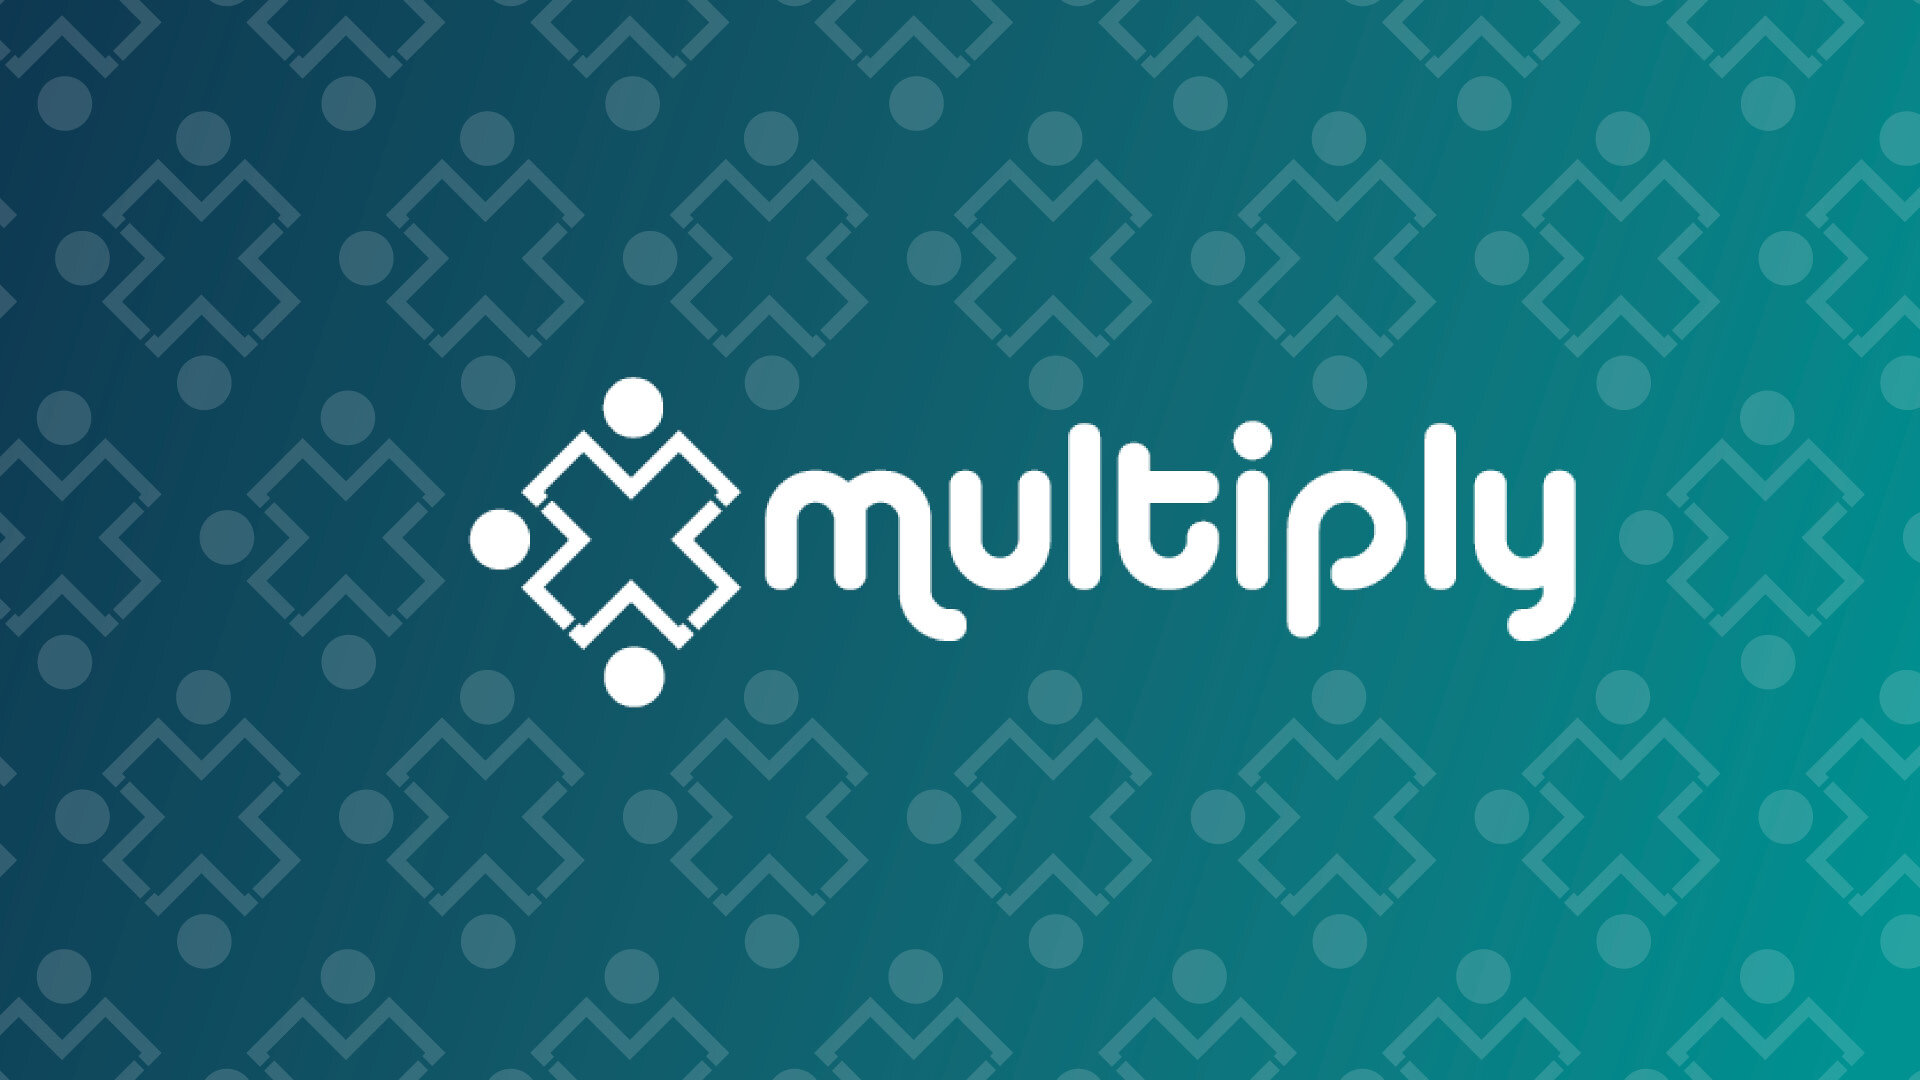 Multiply-SS-Wide.jpg